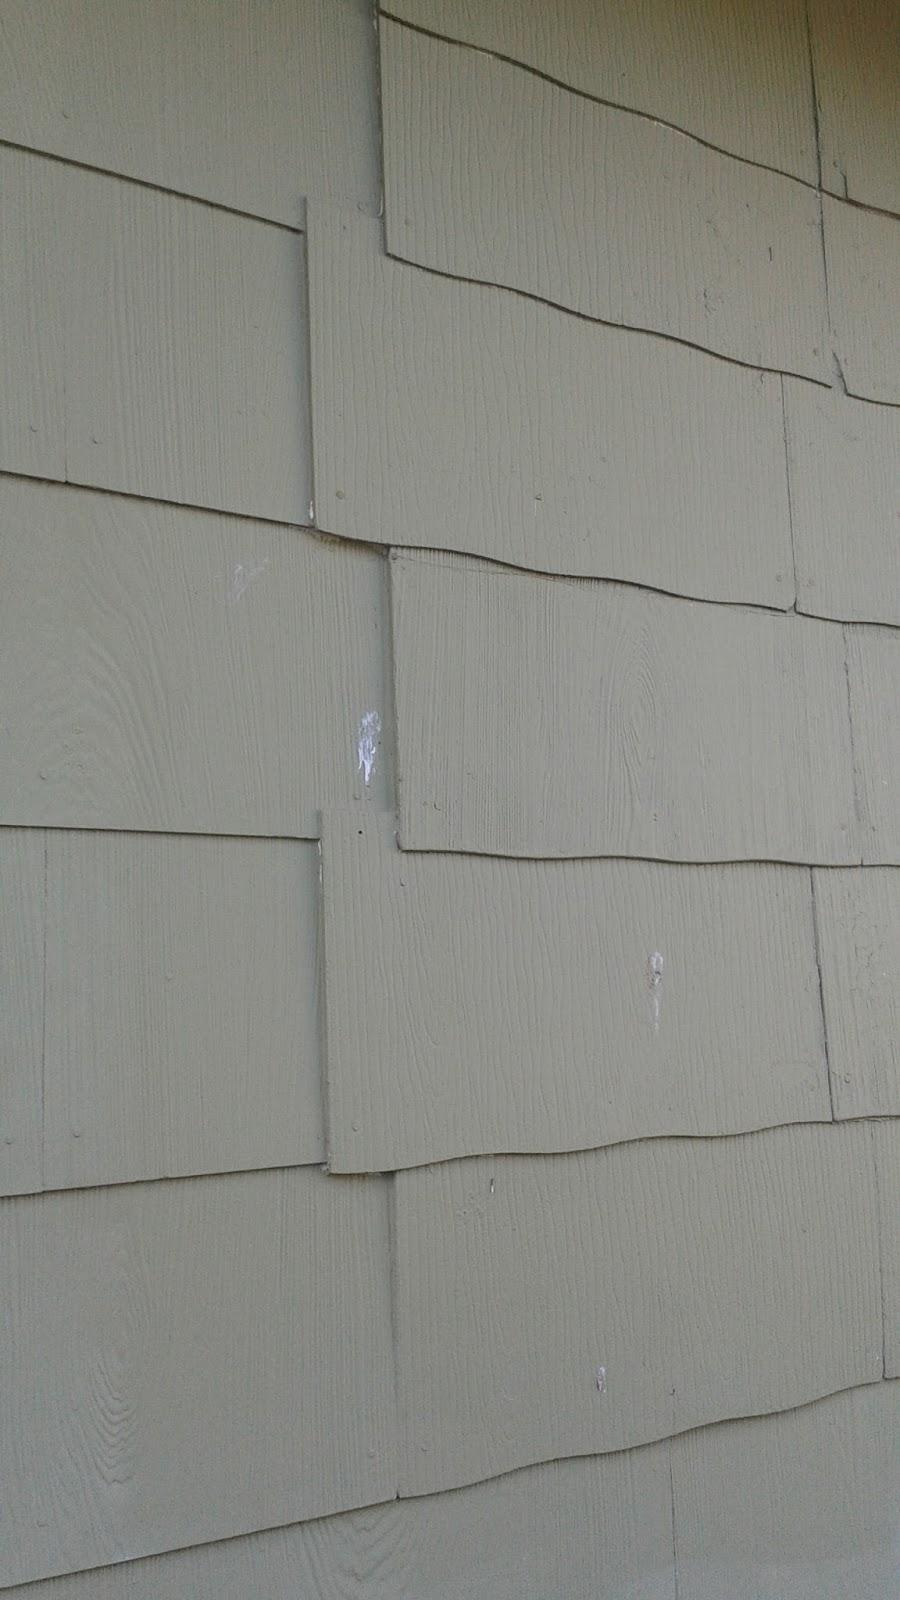 House Siding Materials Top Home Design